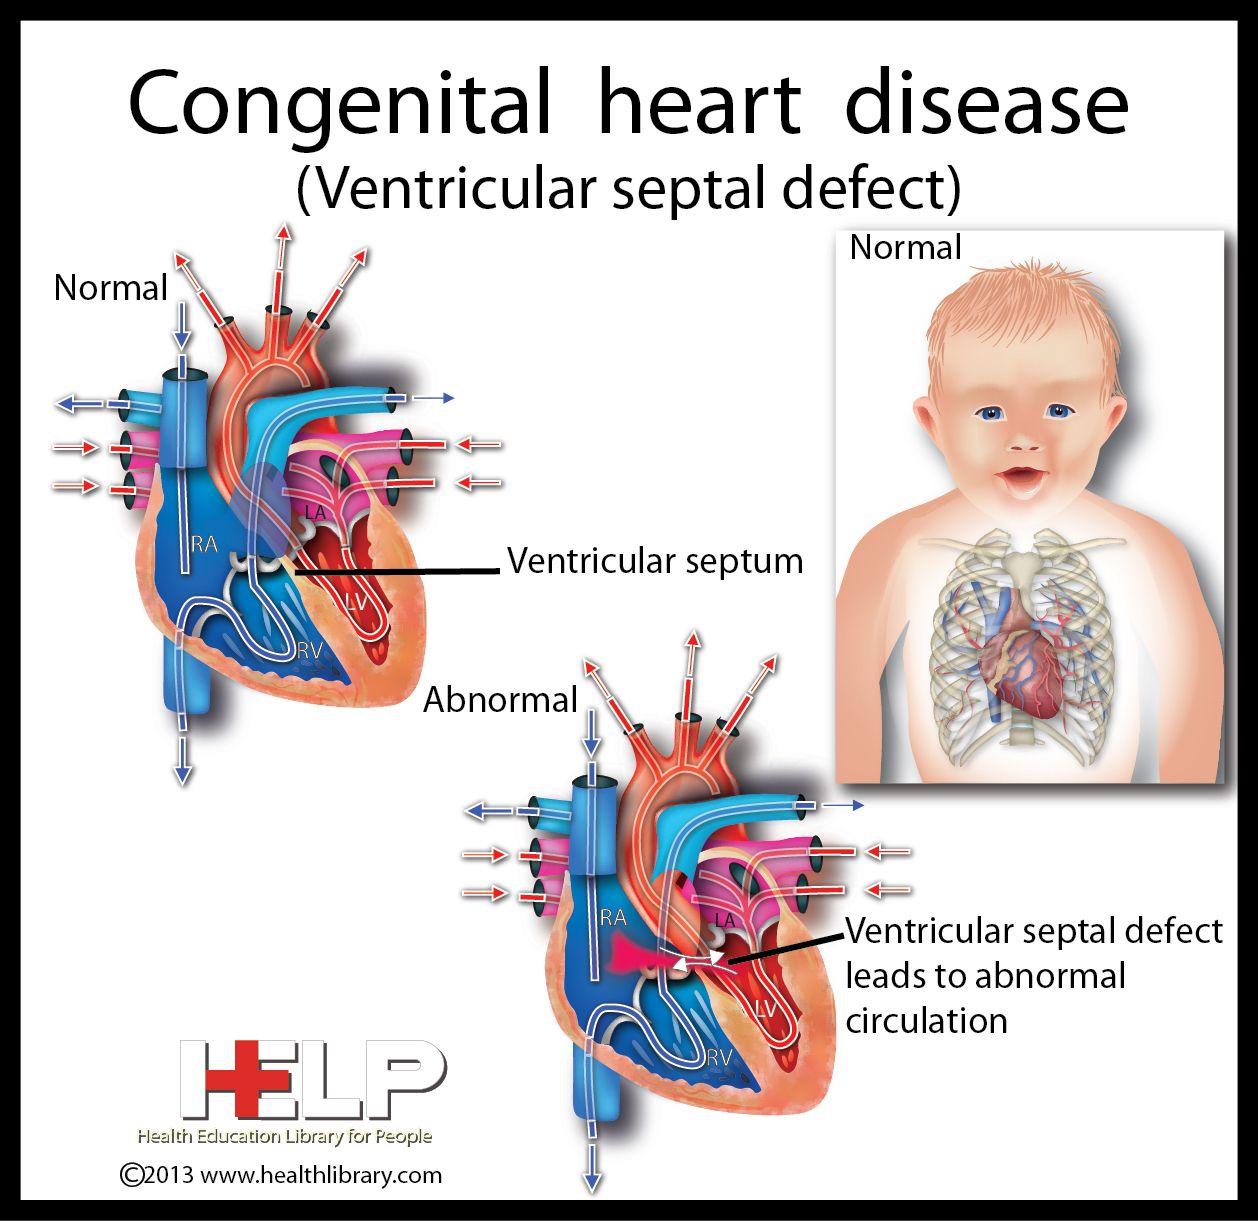 What is a Congenital Heart Defect (CHD)?